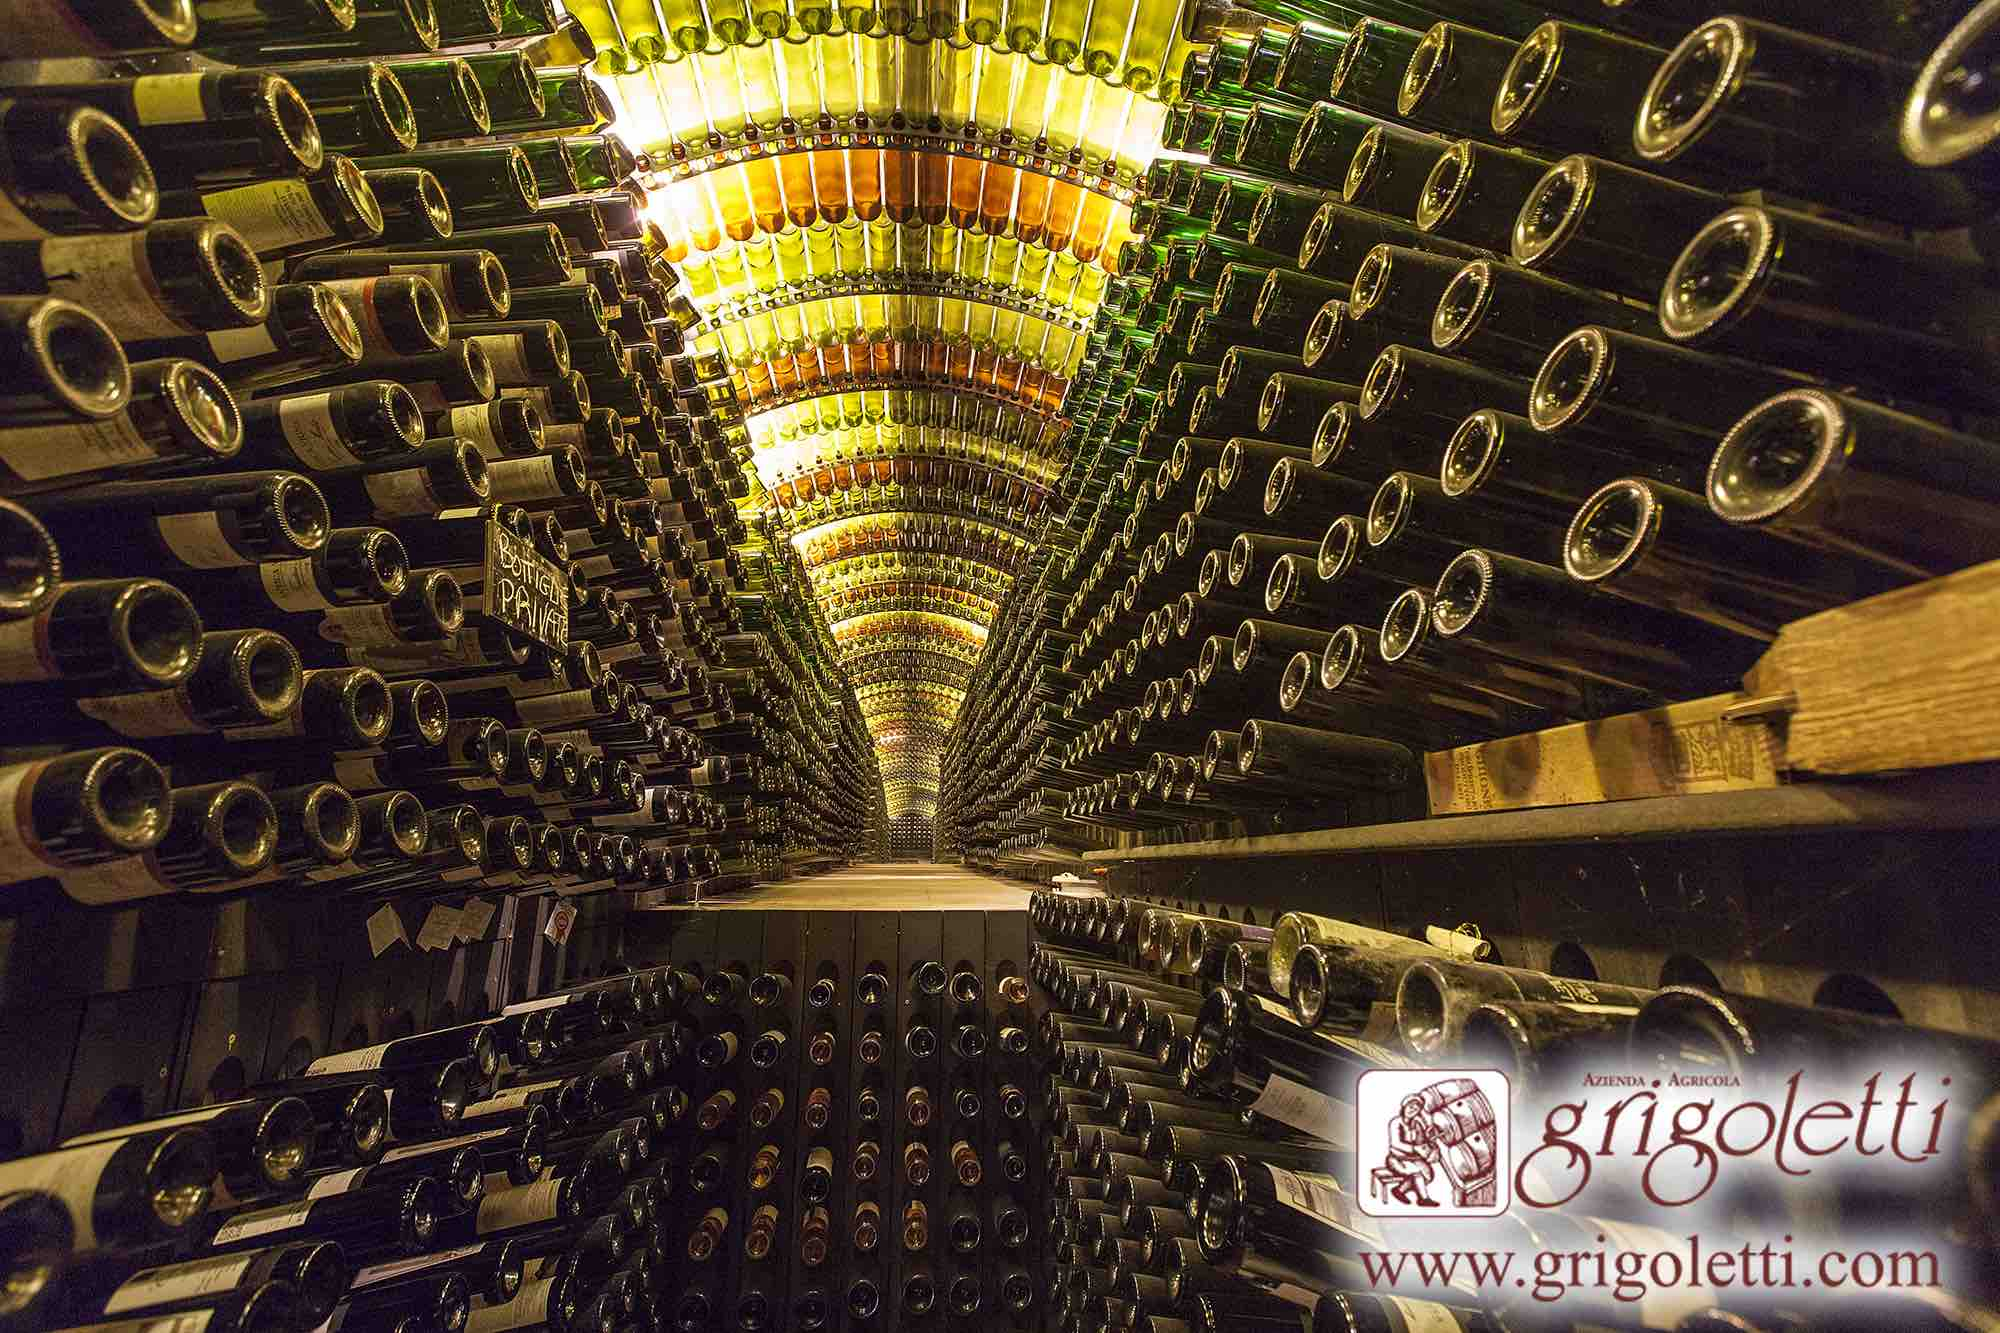 Grigoletti - Caveau del Merlot- vini trentino